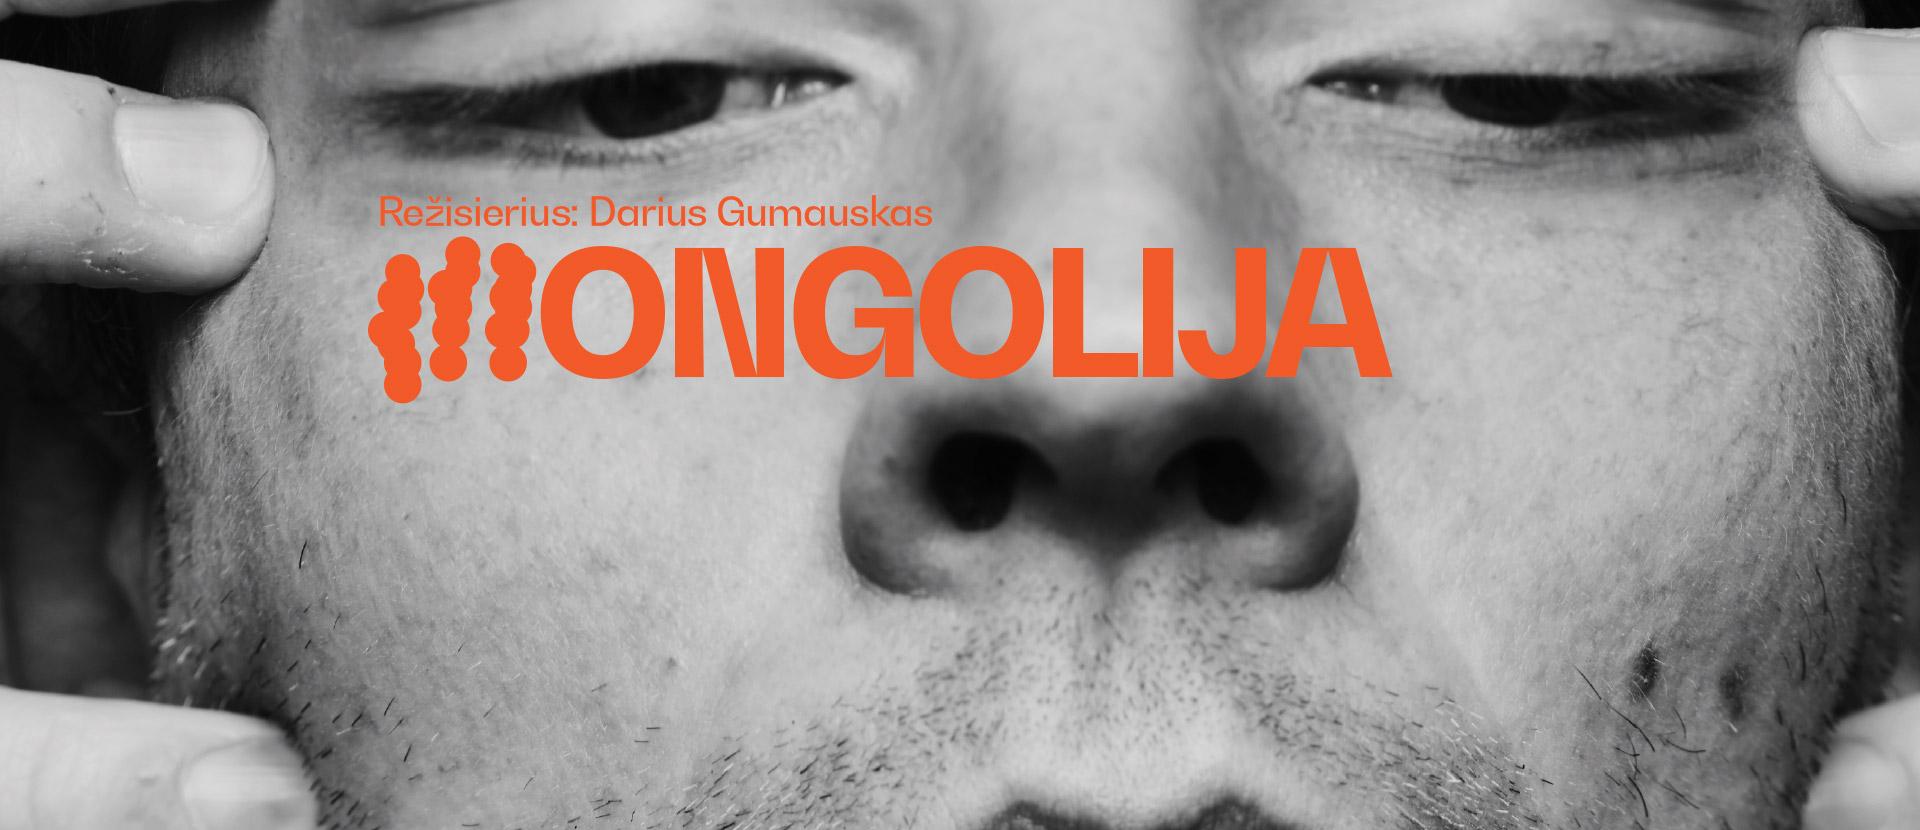 OKT | Vilniaus miesto teatras: Mongolija, rež. Darius Gumauskas